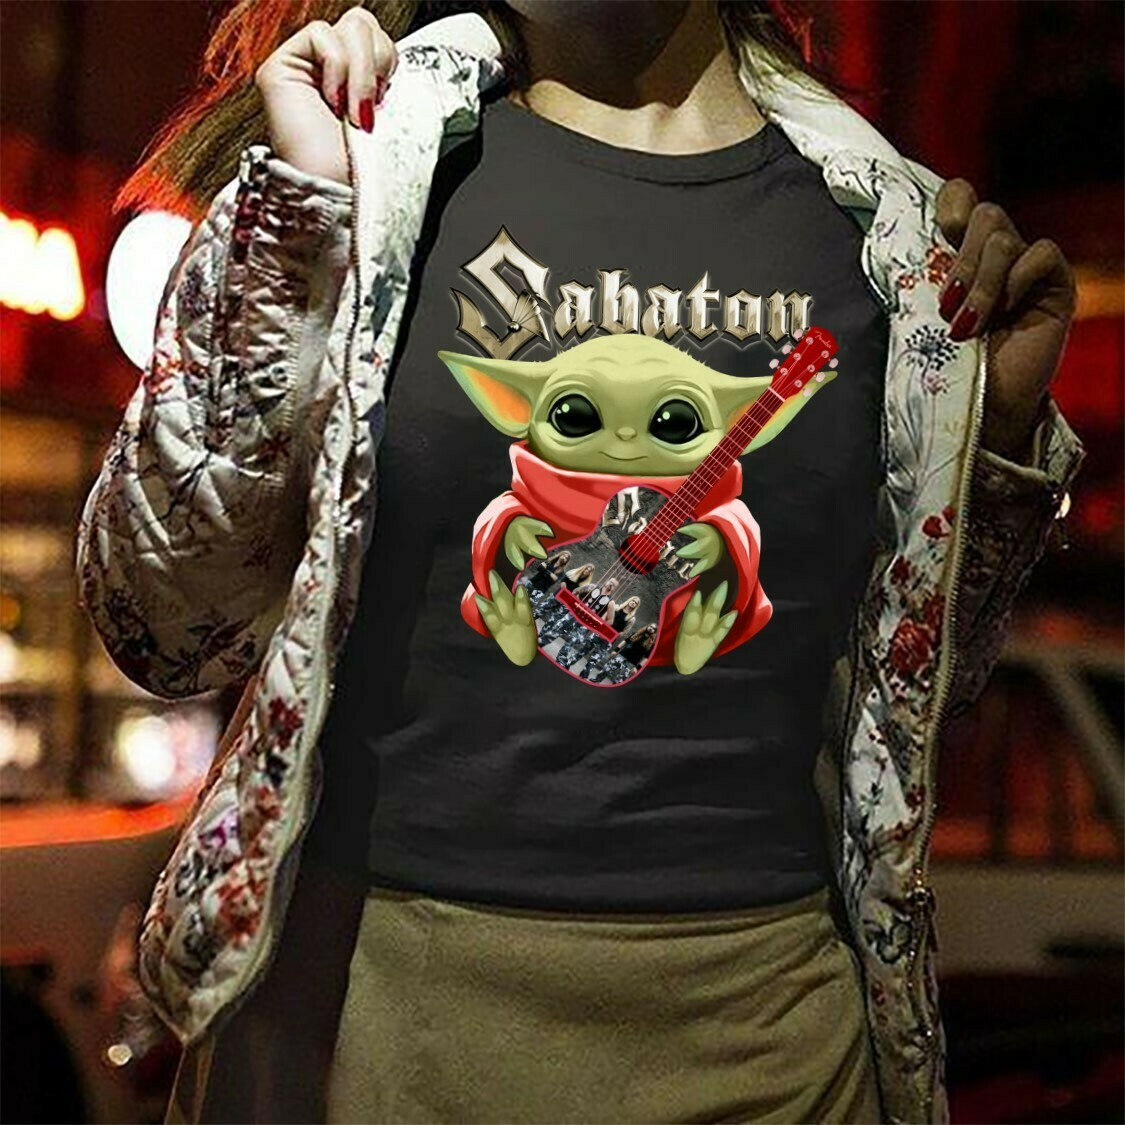 Star Wars Baby Yoda hug guitar Sabaton,The Child The Mandalorian Best Guitarist,Music Teacher Guitar Gift T-Shirt Long Sleeve Sweatshirt Hoodie Jolly Family Gifts